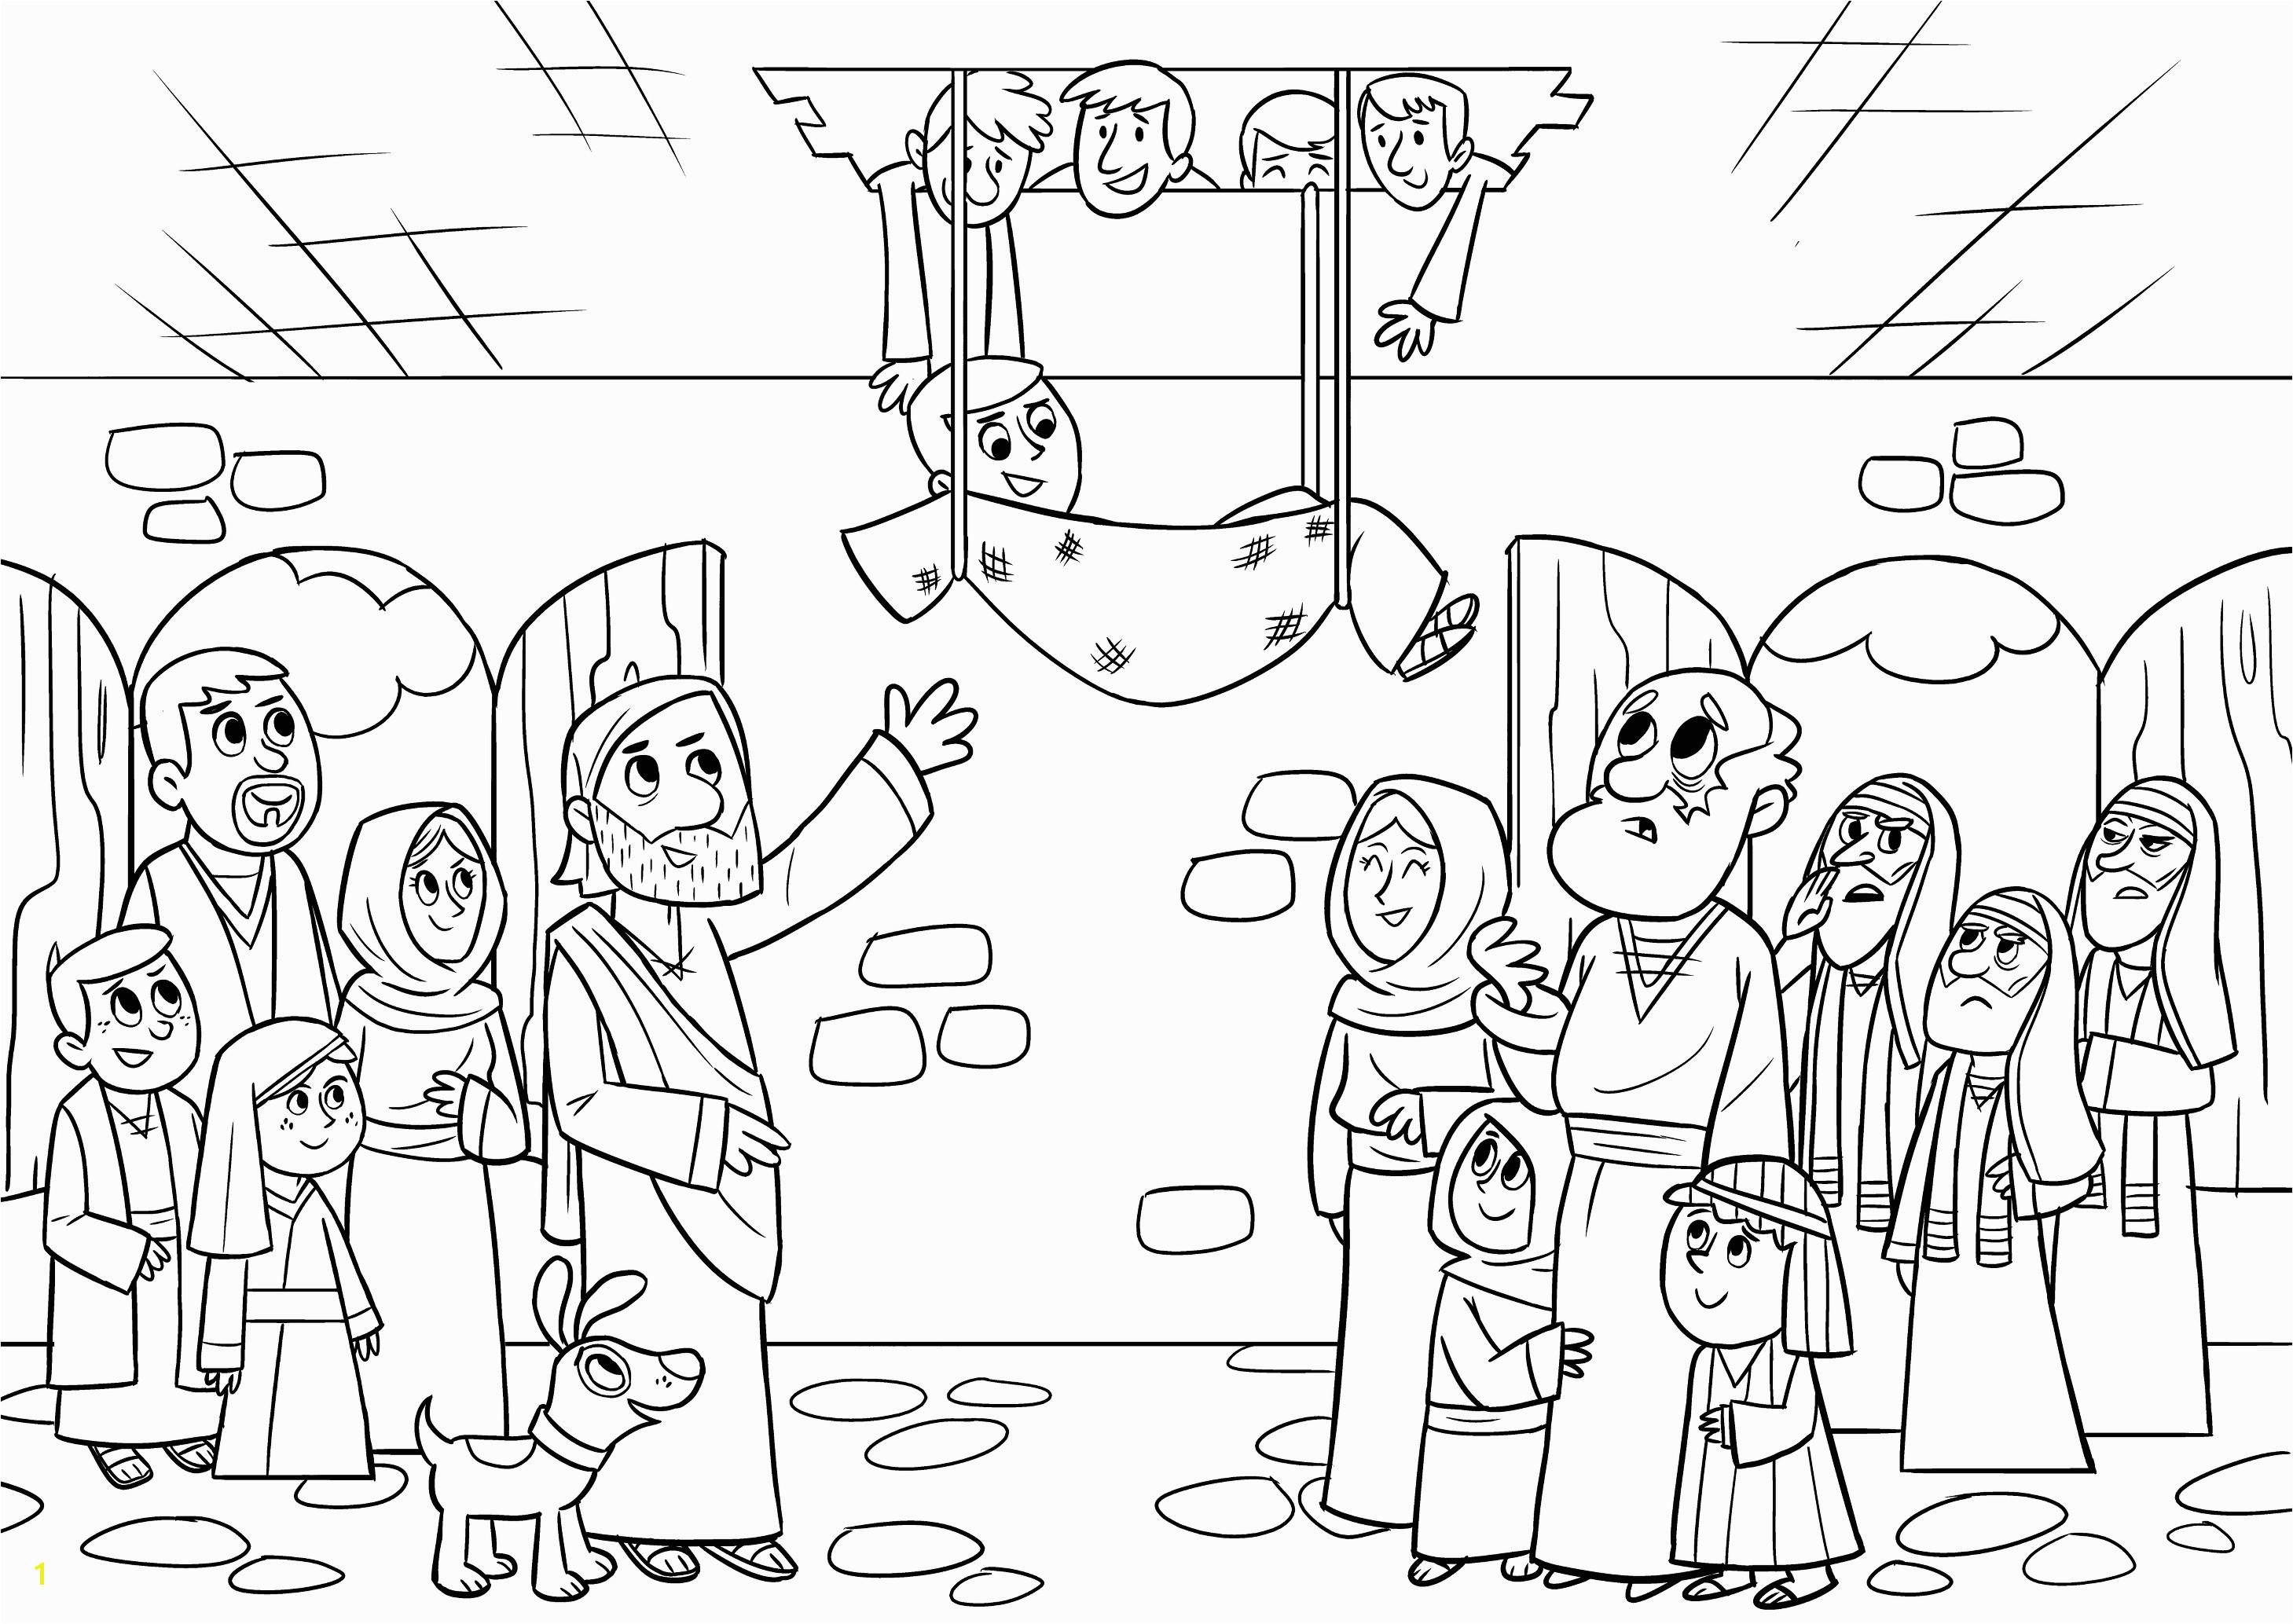 Four Friends Help A Paralyzed Man Coloring Pages Bible App for Kids Parent Resources